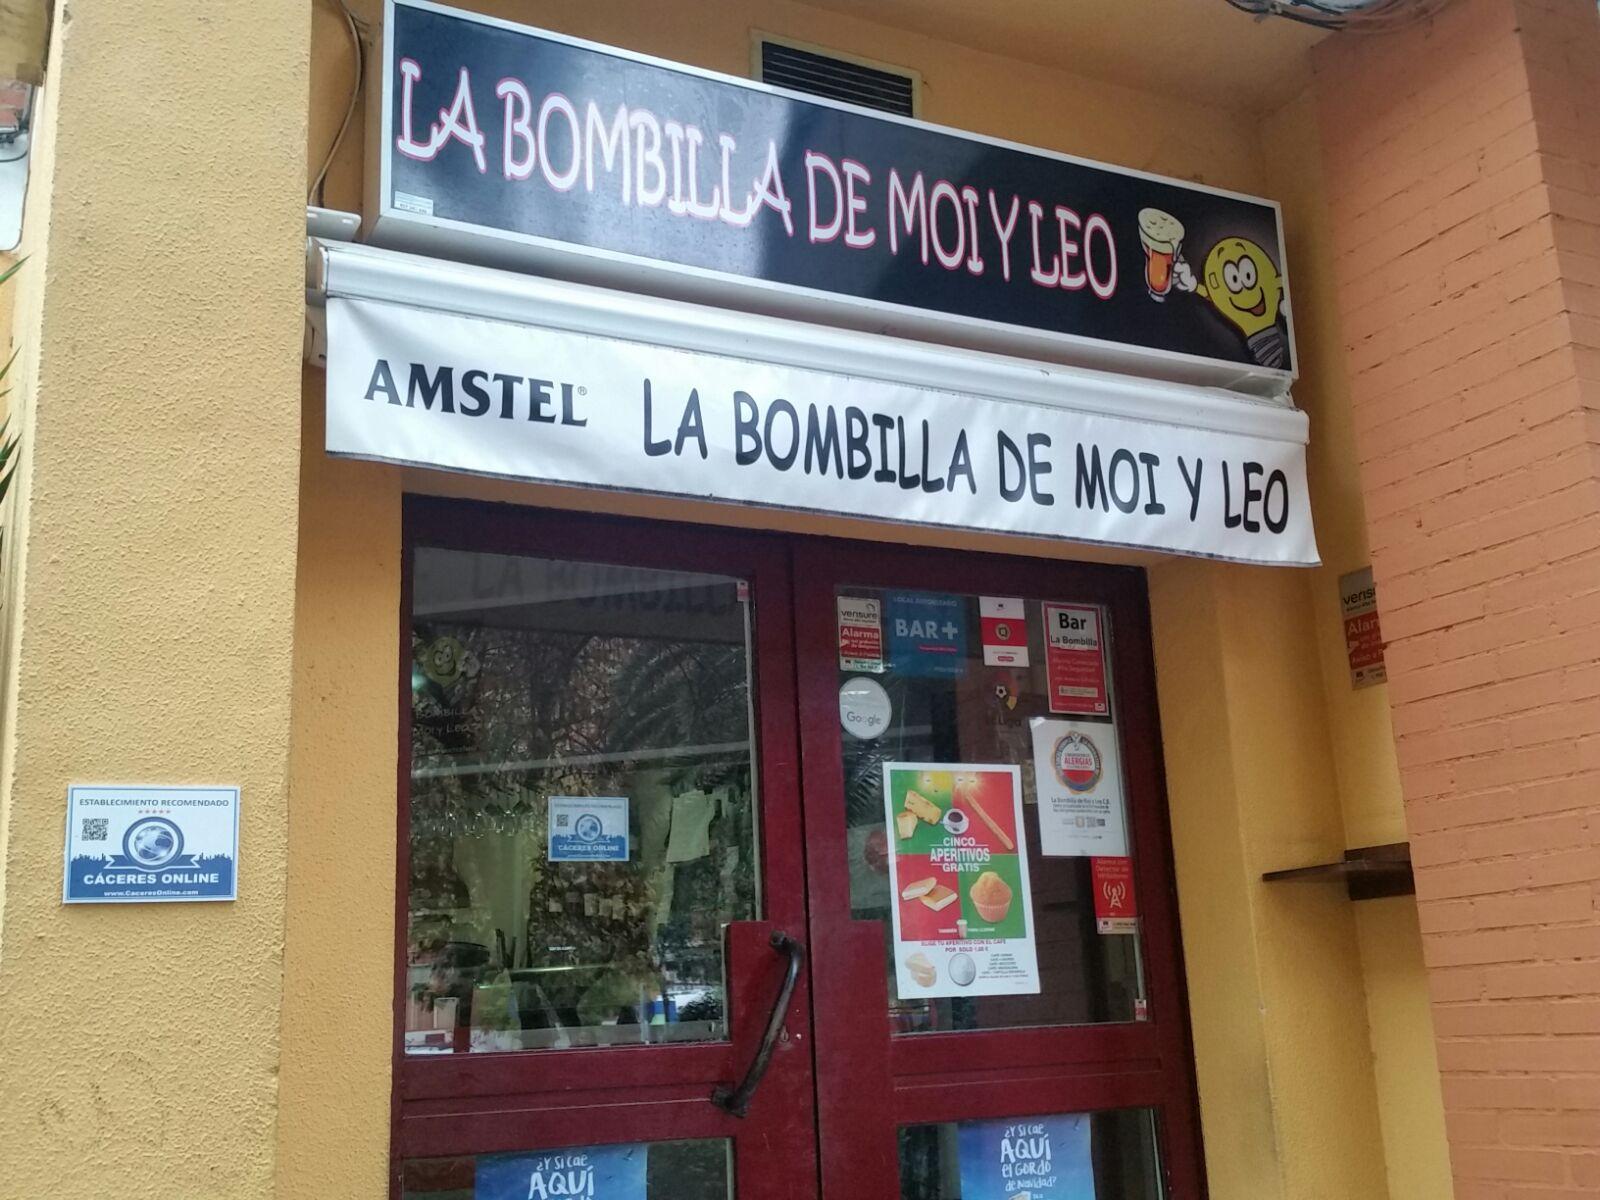 LA BOMBILLA DE MOI Y LEO